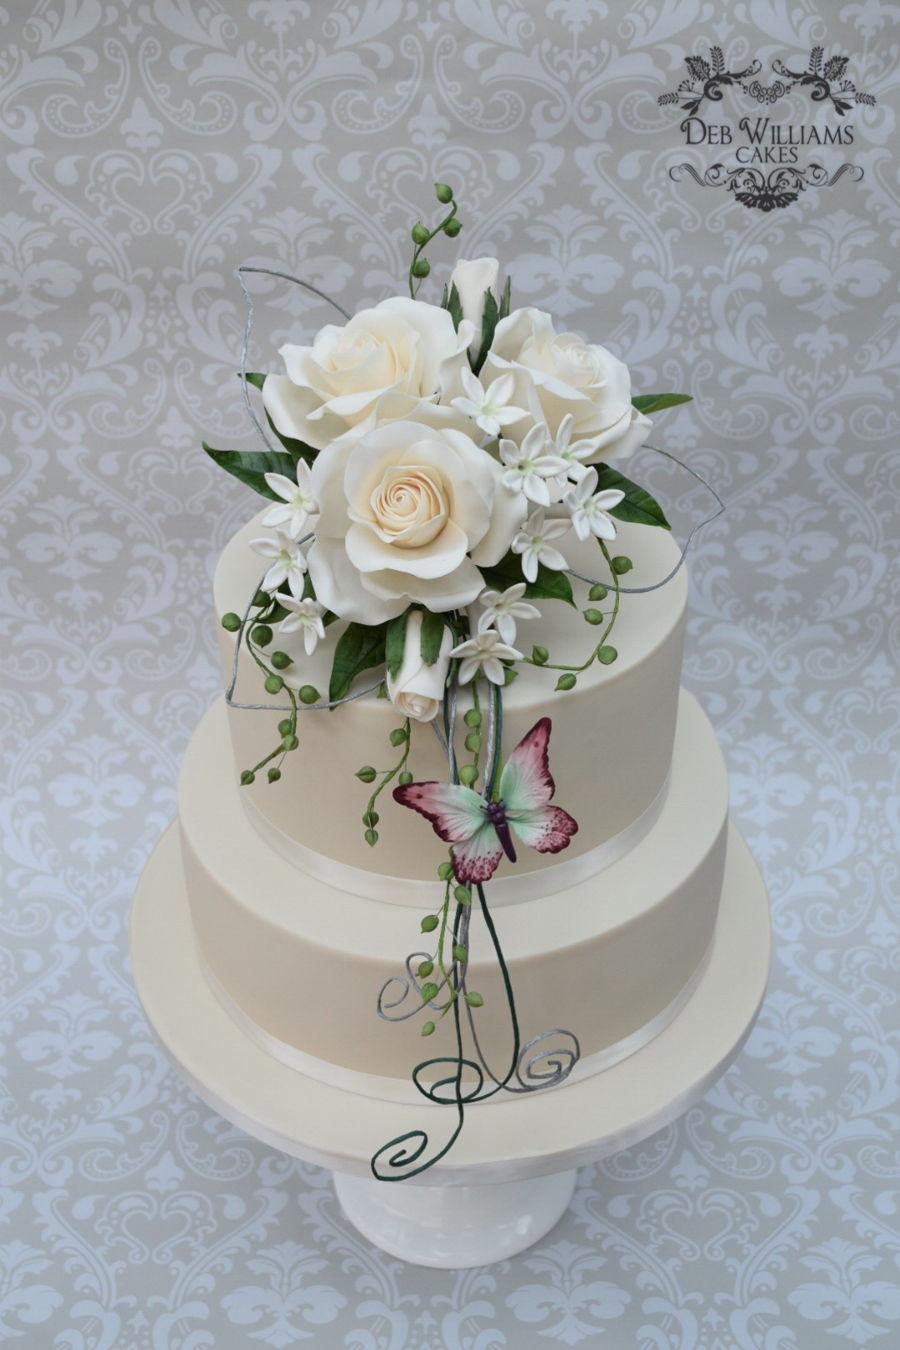 Sugarcraft Flowers Wedding Cakes  Sugar Flowers Wedding Cake CakeCentral